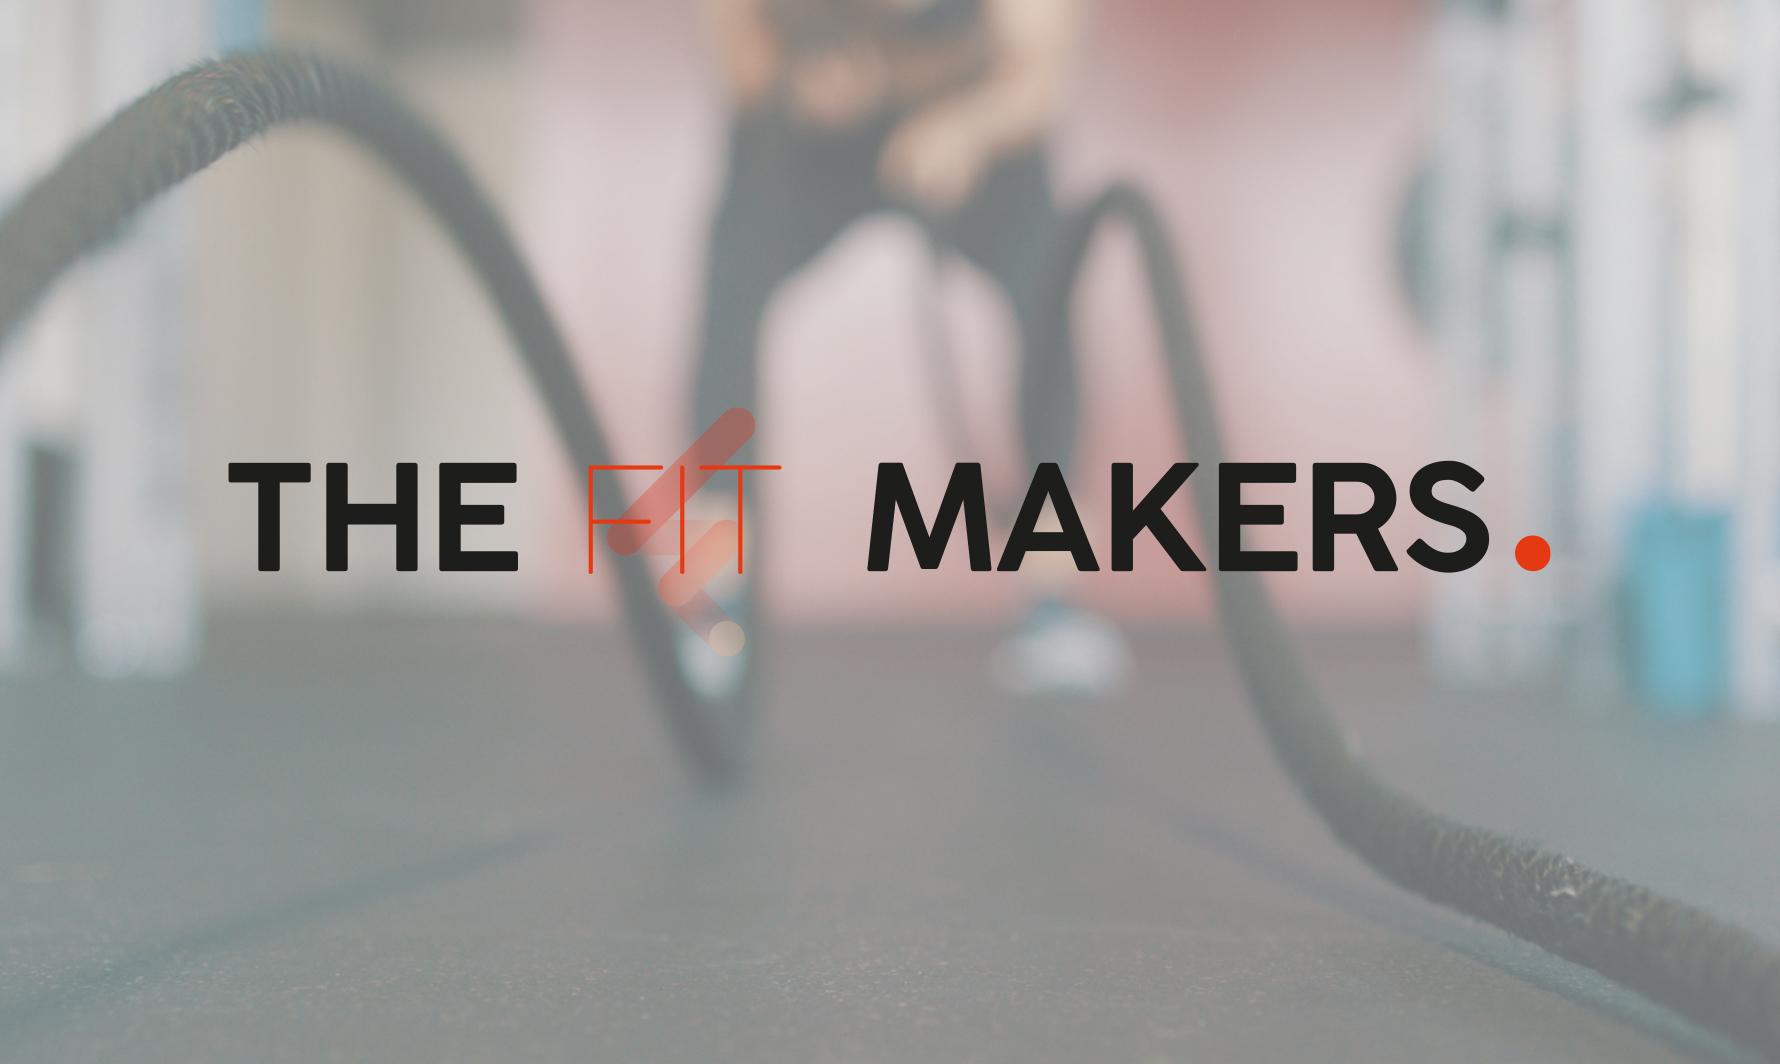 salamo design the fit makers portfolio 3